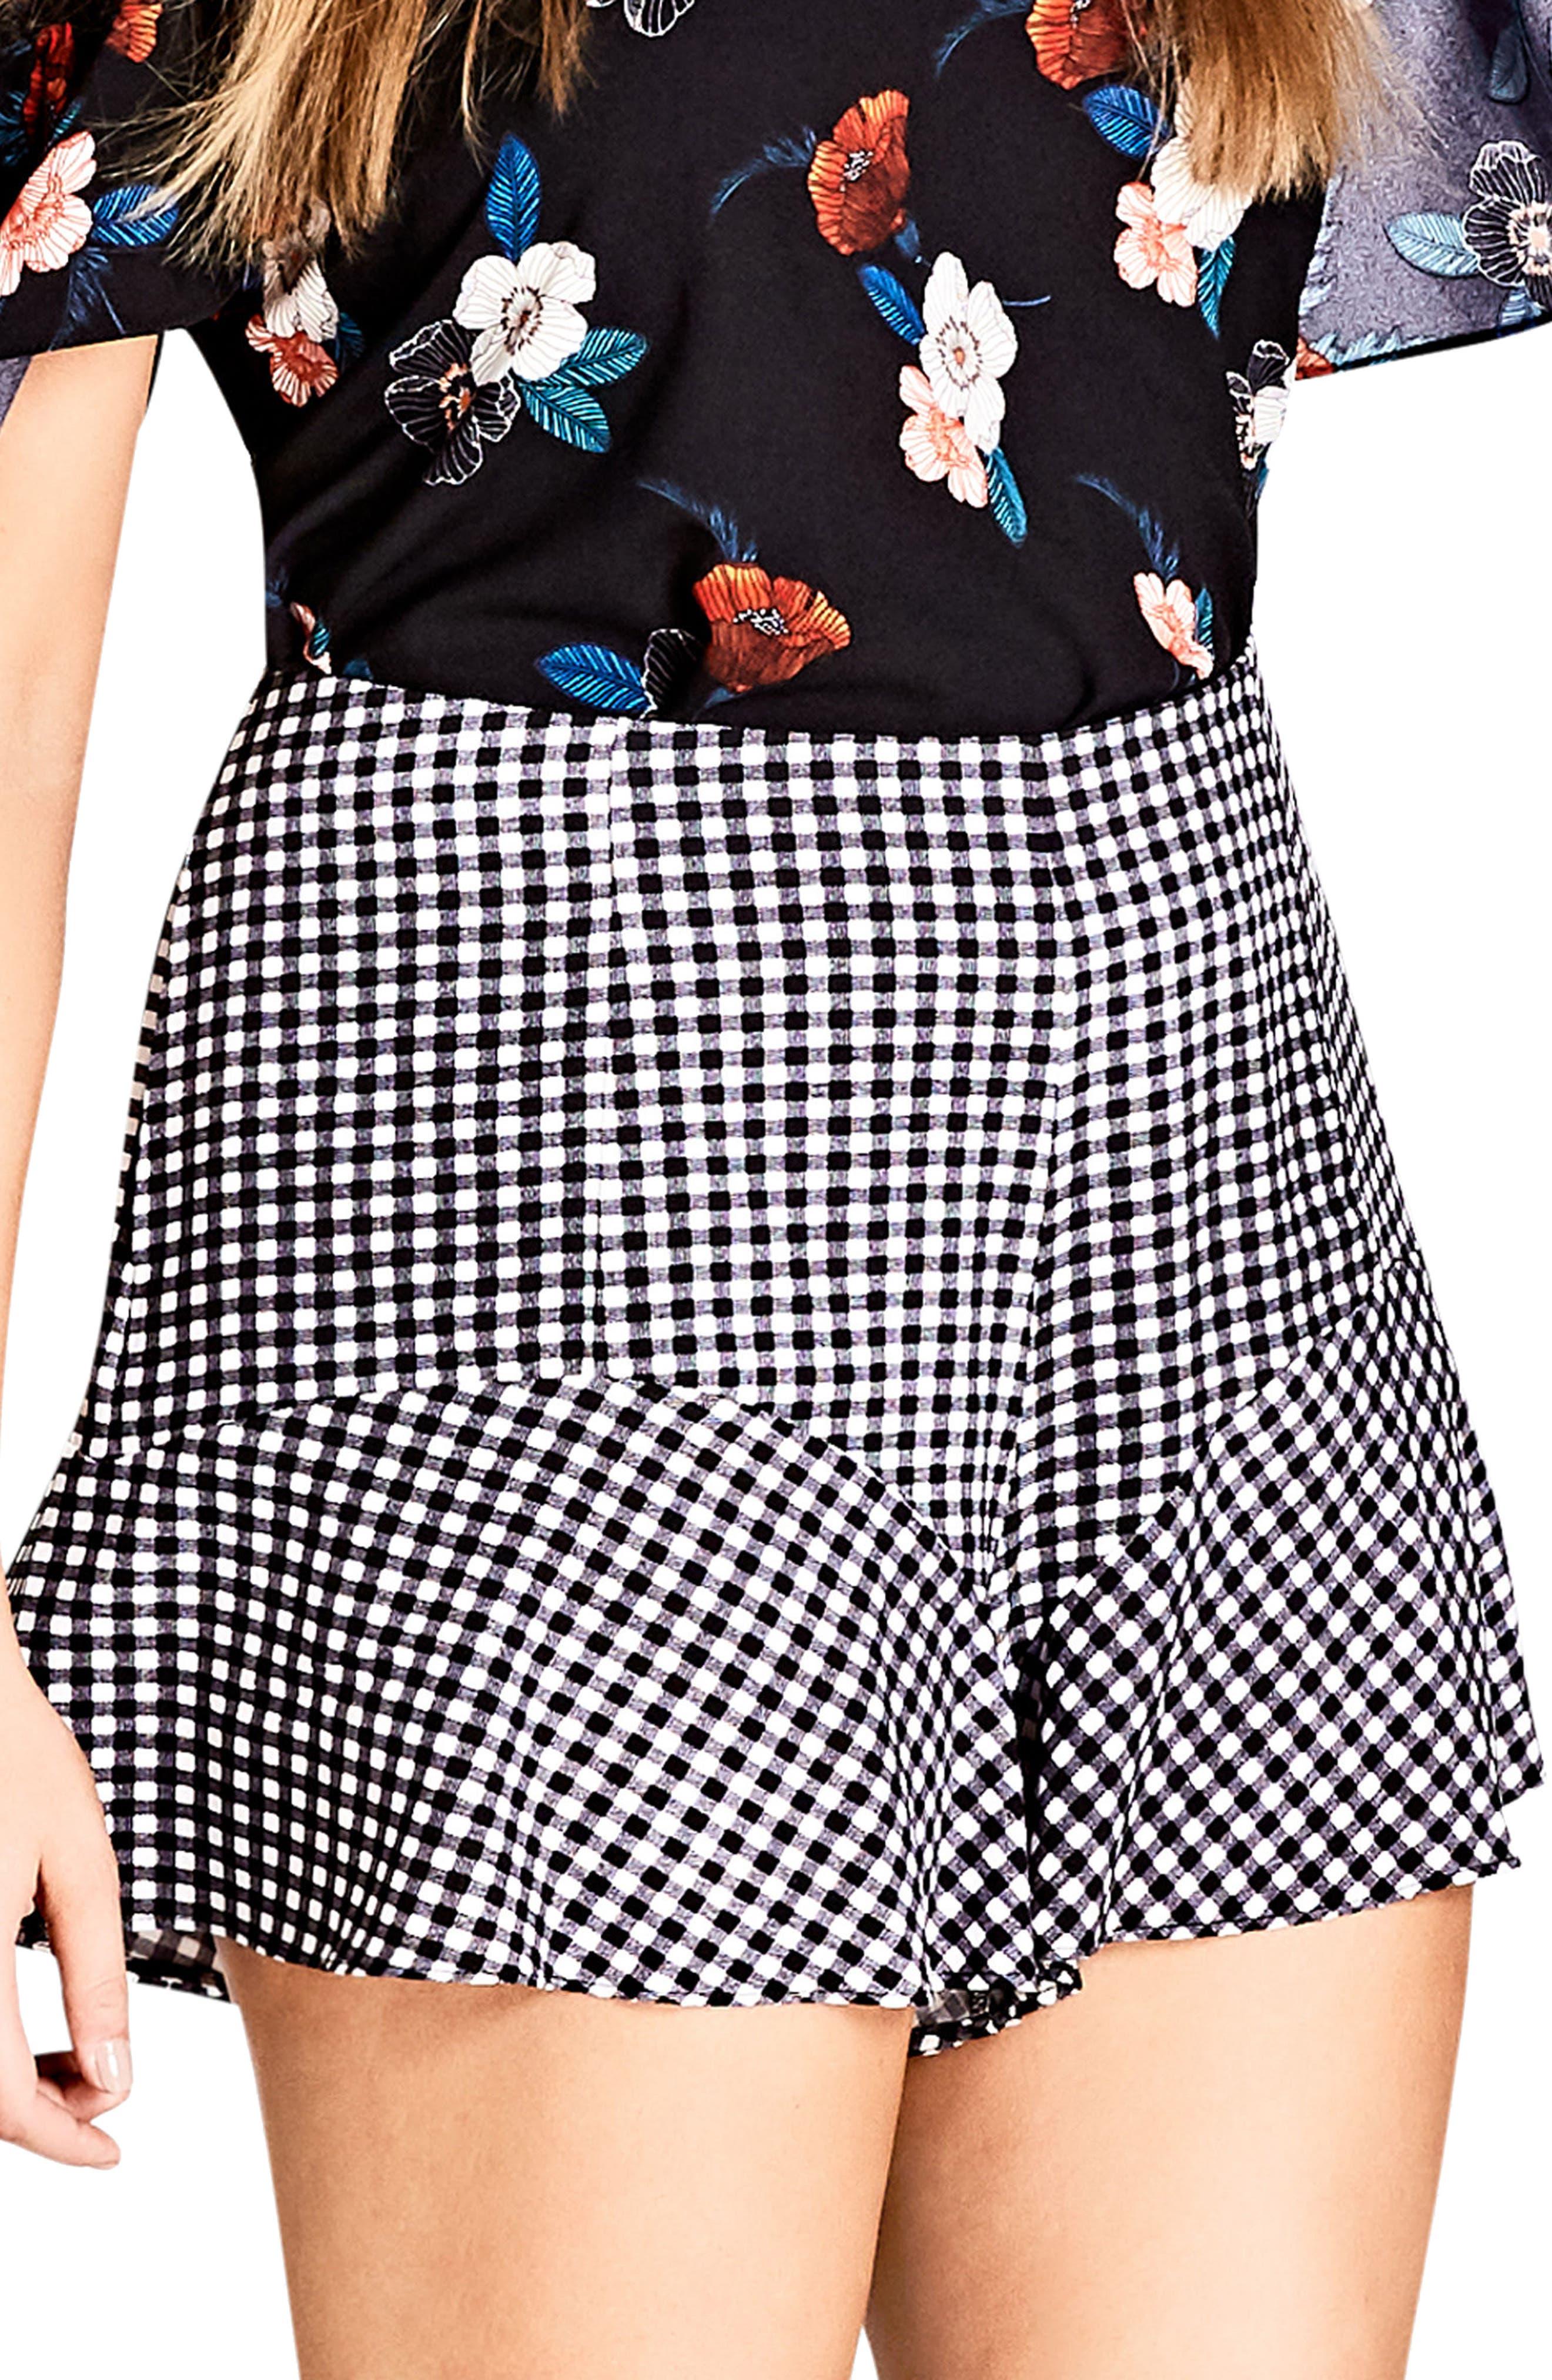 Vintage High Waisted Shorts, Sailor Shorts, Capris Plus Size Womens City Chic Cute Gingham Flutter Shorts Size Small - Black $59.00 AT vintagedancer.com